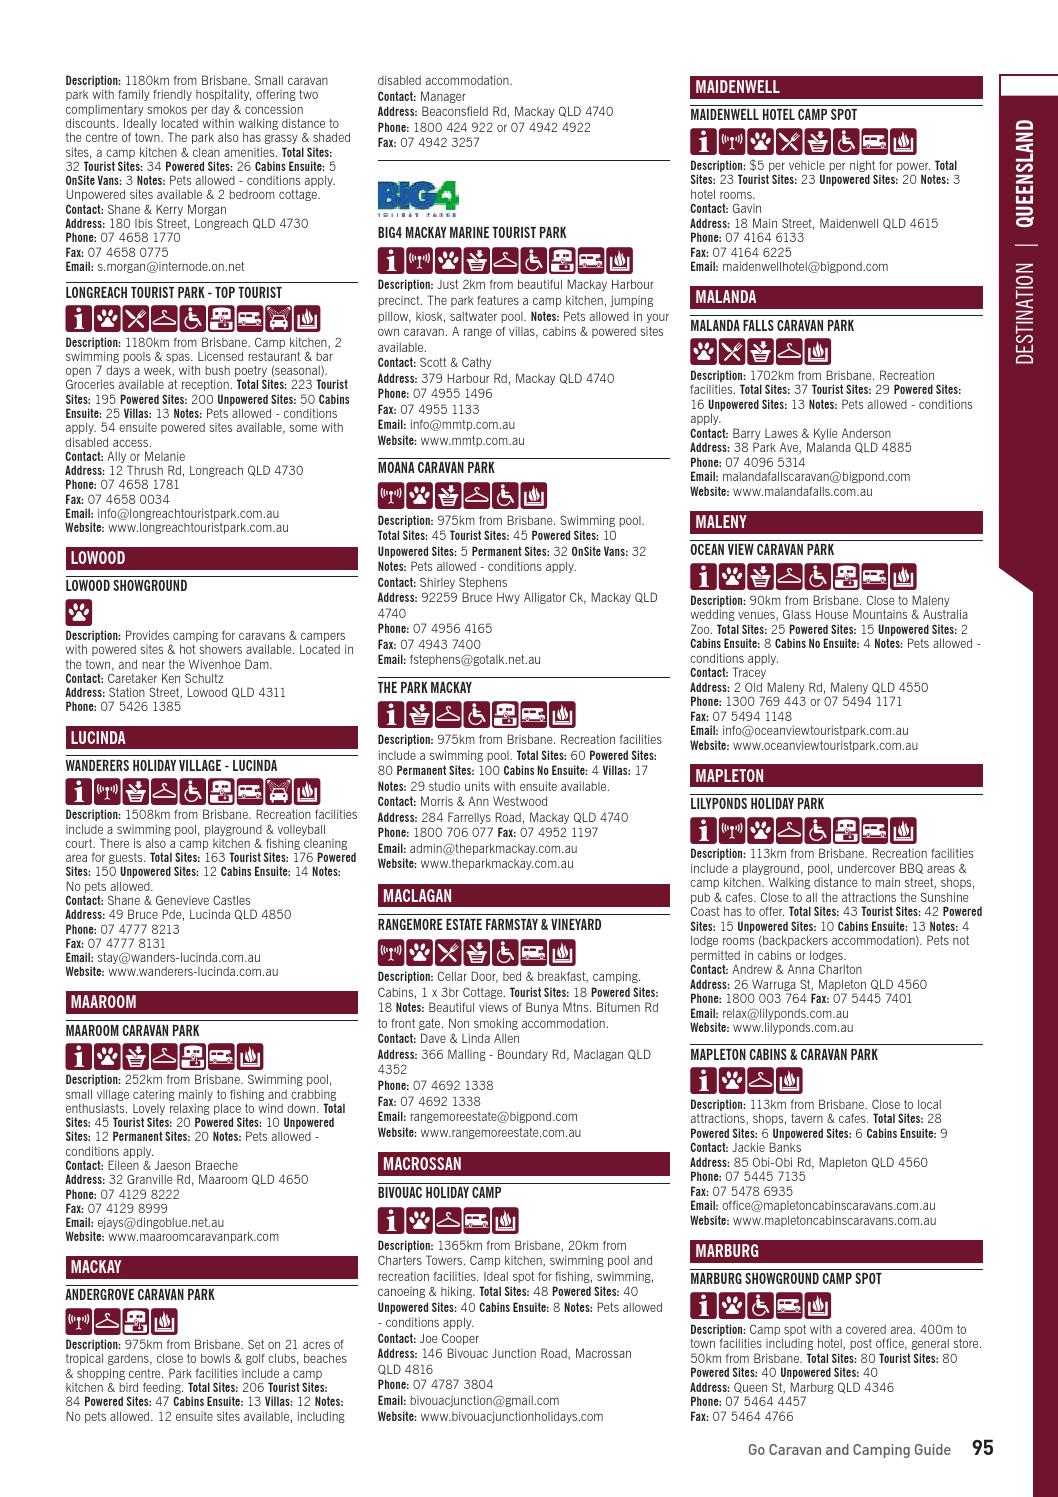 Go Caravan & Camping Guide - Vol 3 by Vink Publishing - issuu